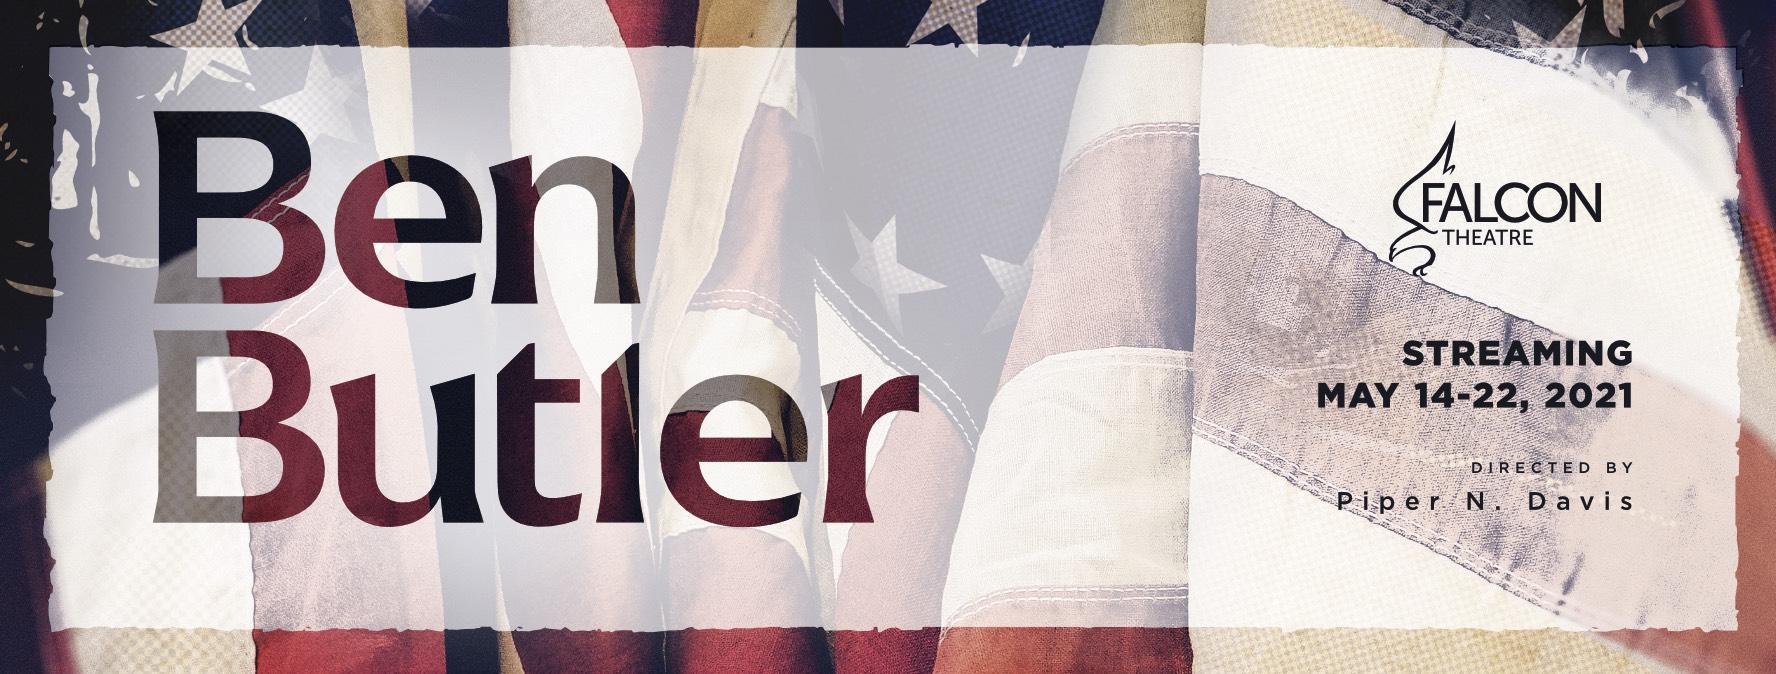 FT_Ben Butler logo